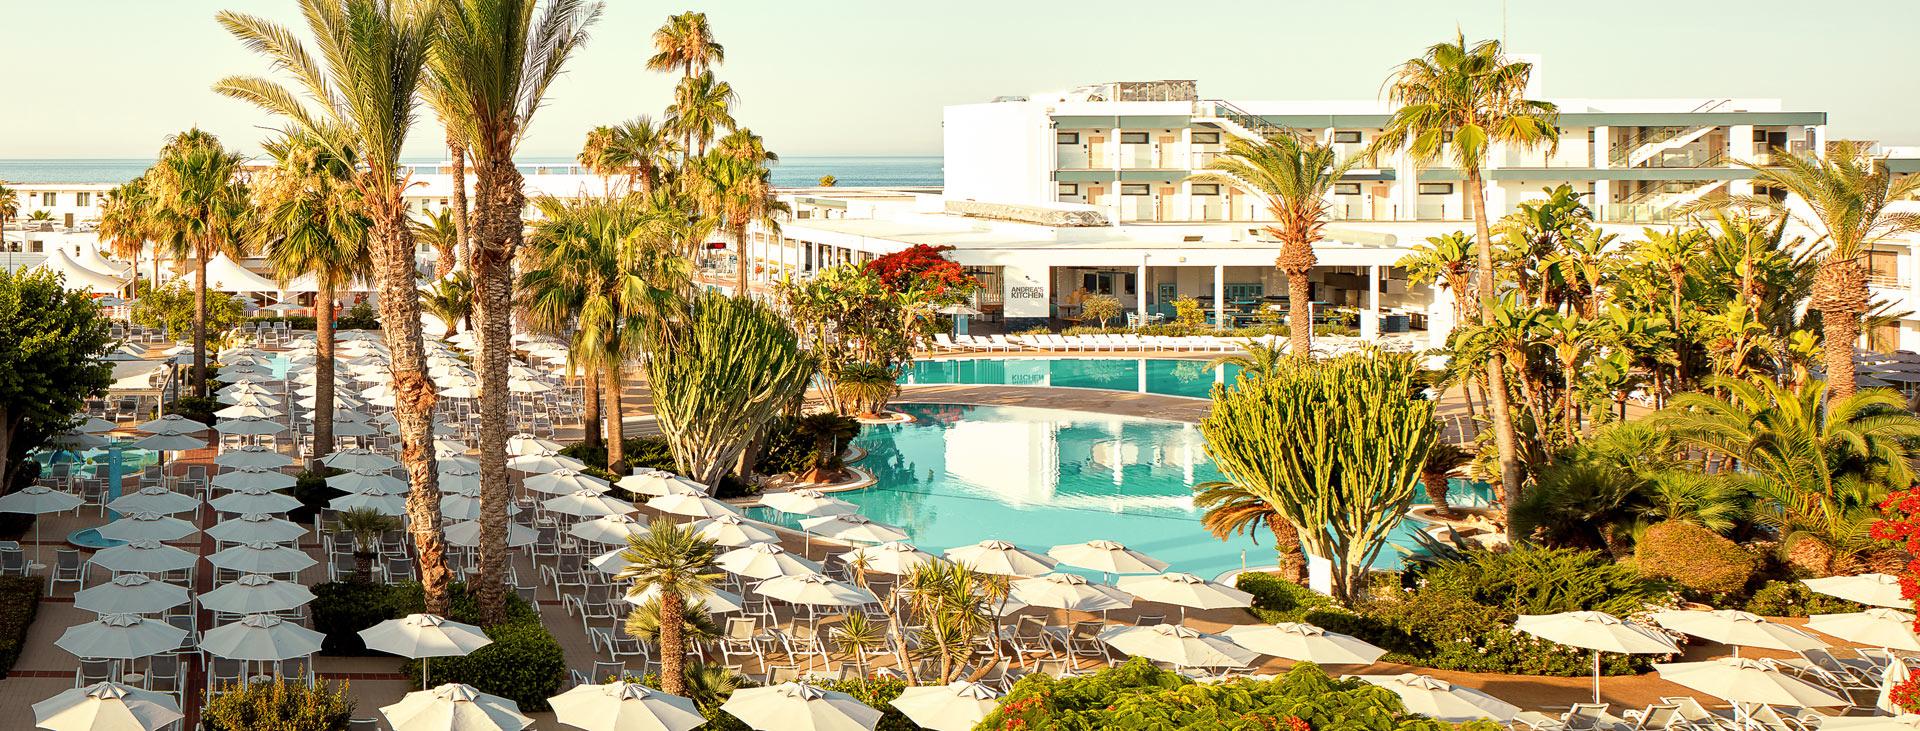 Sunwing Sandy Bay Beach, Ayia Napa, Cypern, Cypern